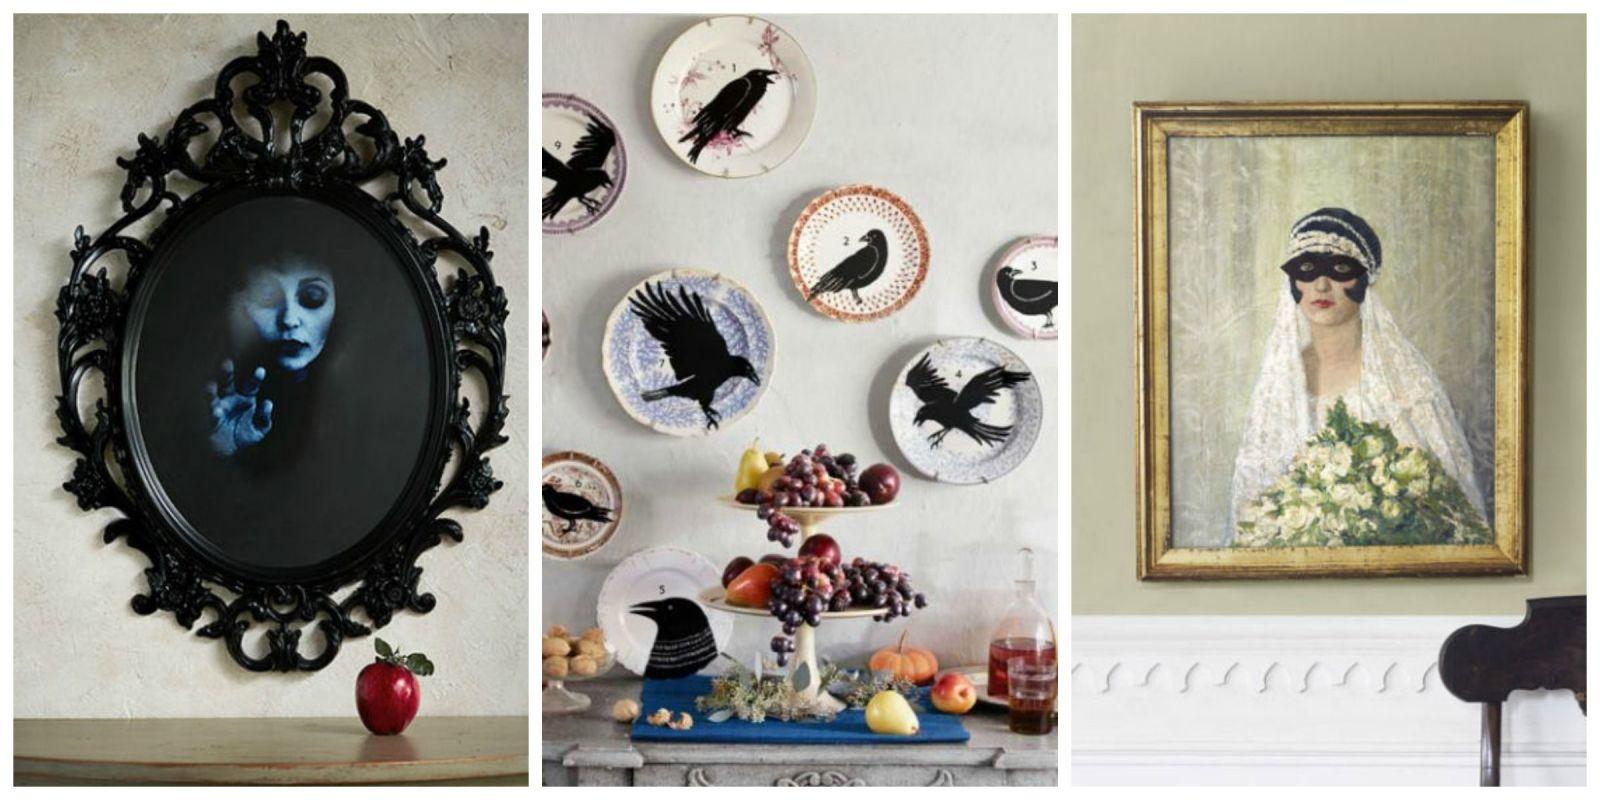 9 homemade halloween decorations halloween art - Halloween Homemade Decorations